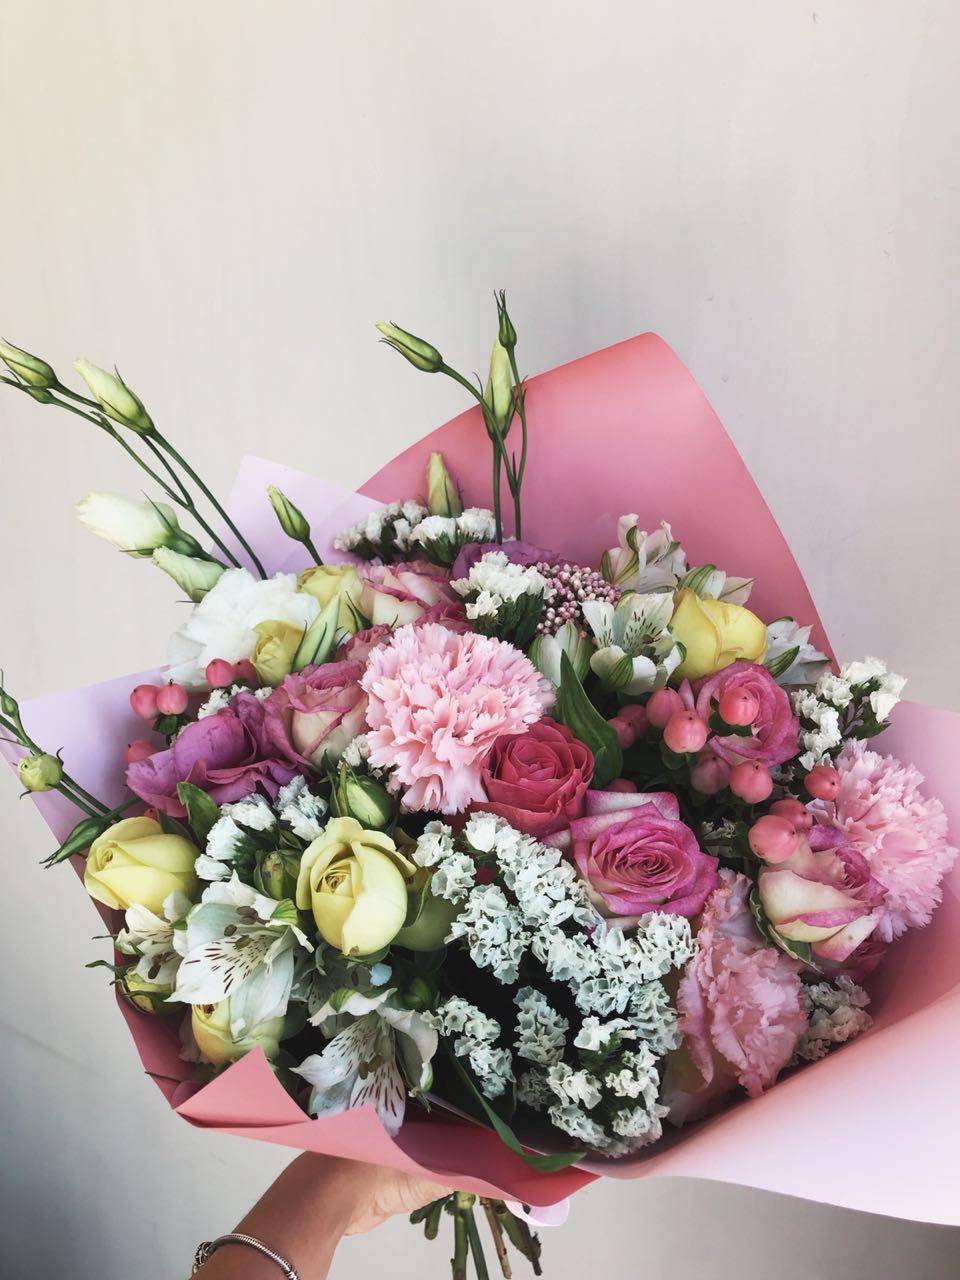 Цветы бамбук, доставка цветов самара отзывы